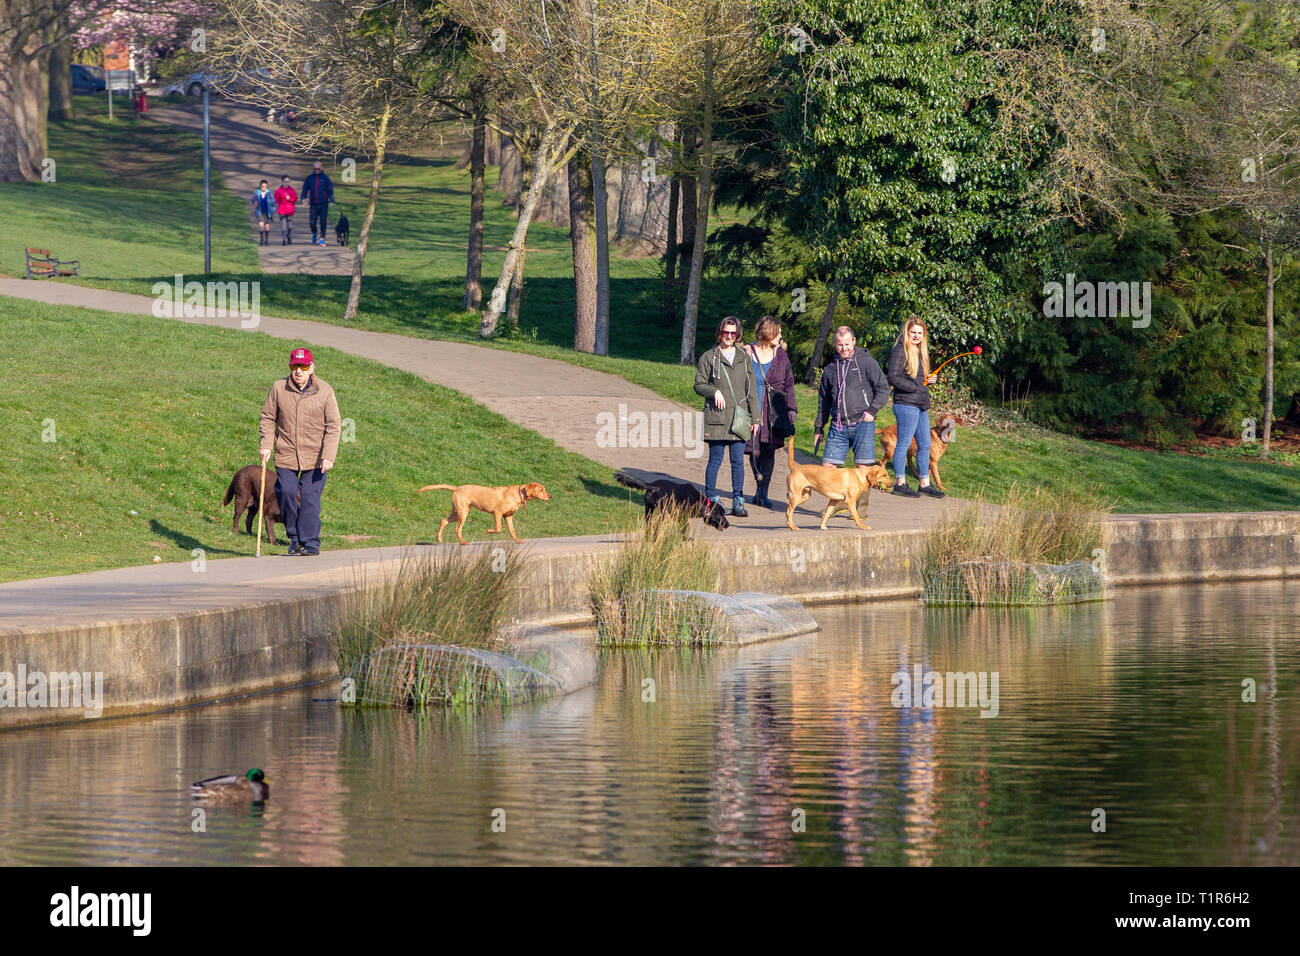 Northampton, Northamptonshire. 28th March 2019. Abington Park. People and dogs enjoying the warm morning sunshine. Credit: Keith J Smith./Alamy Live News - Stock Image